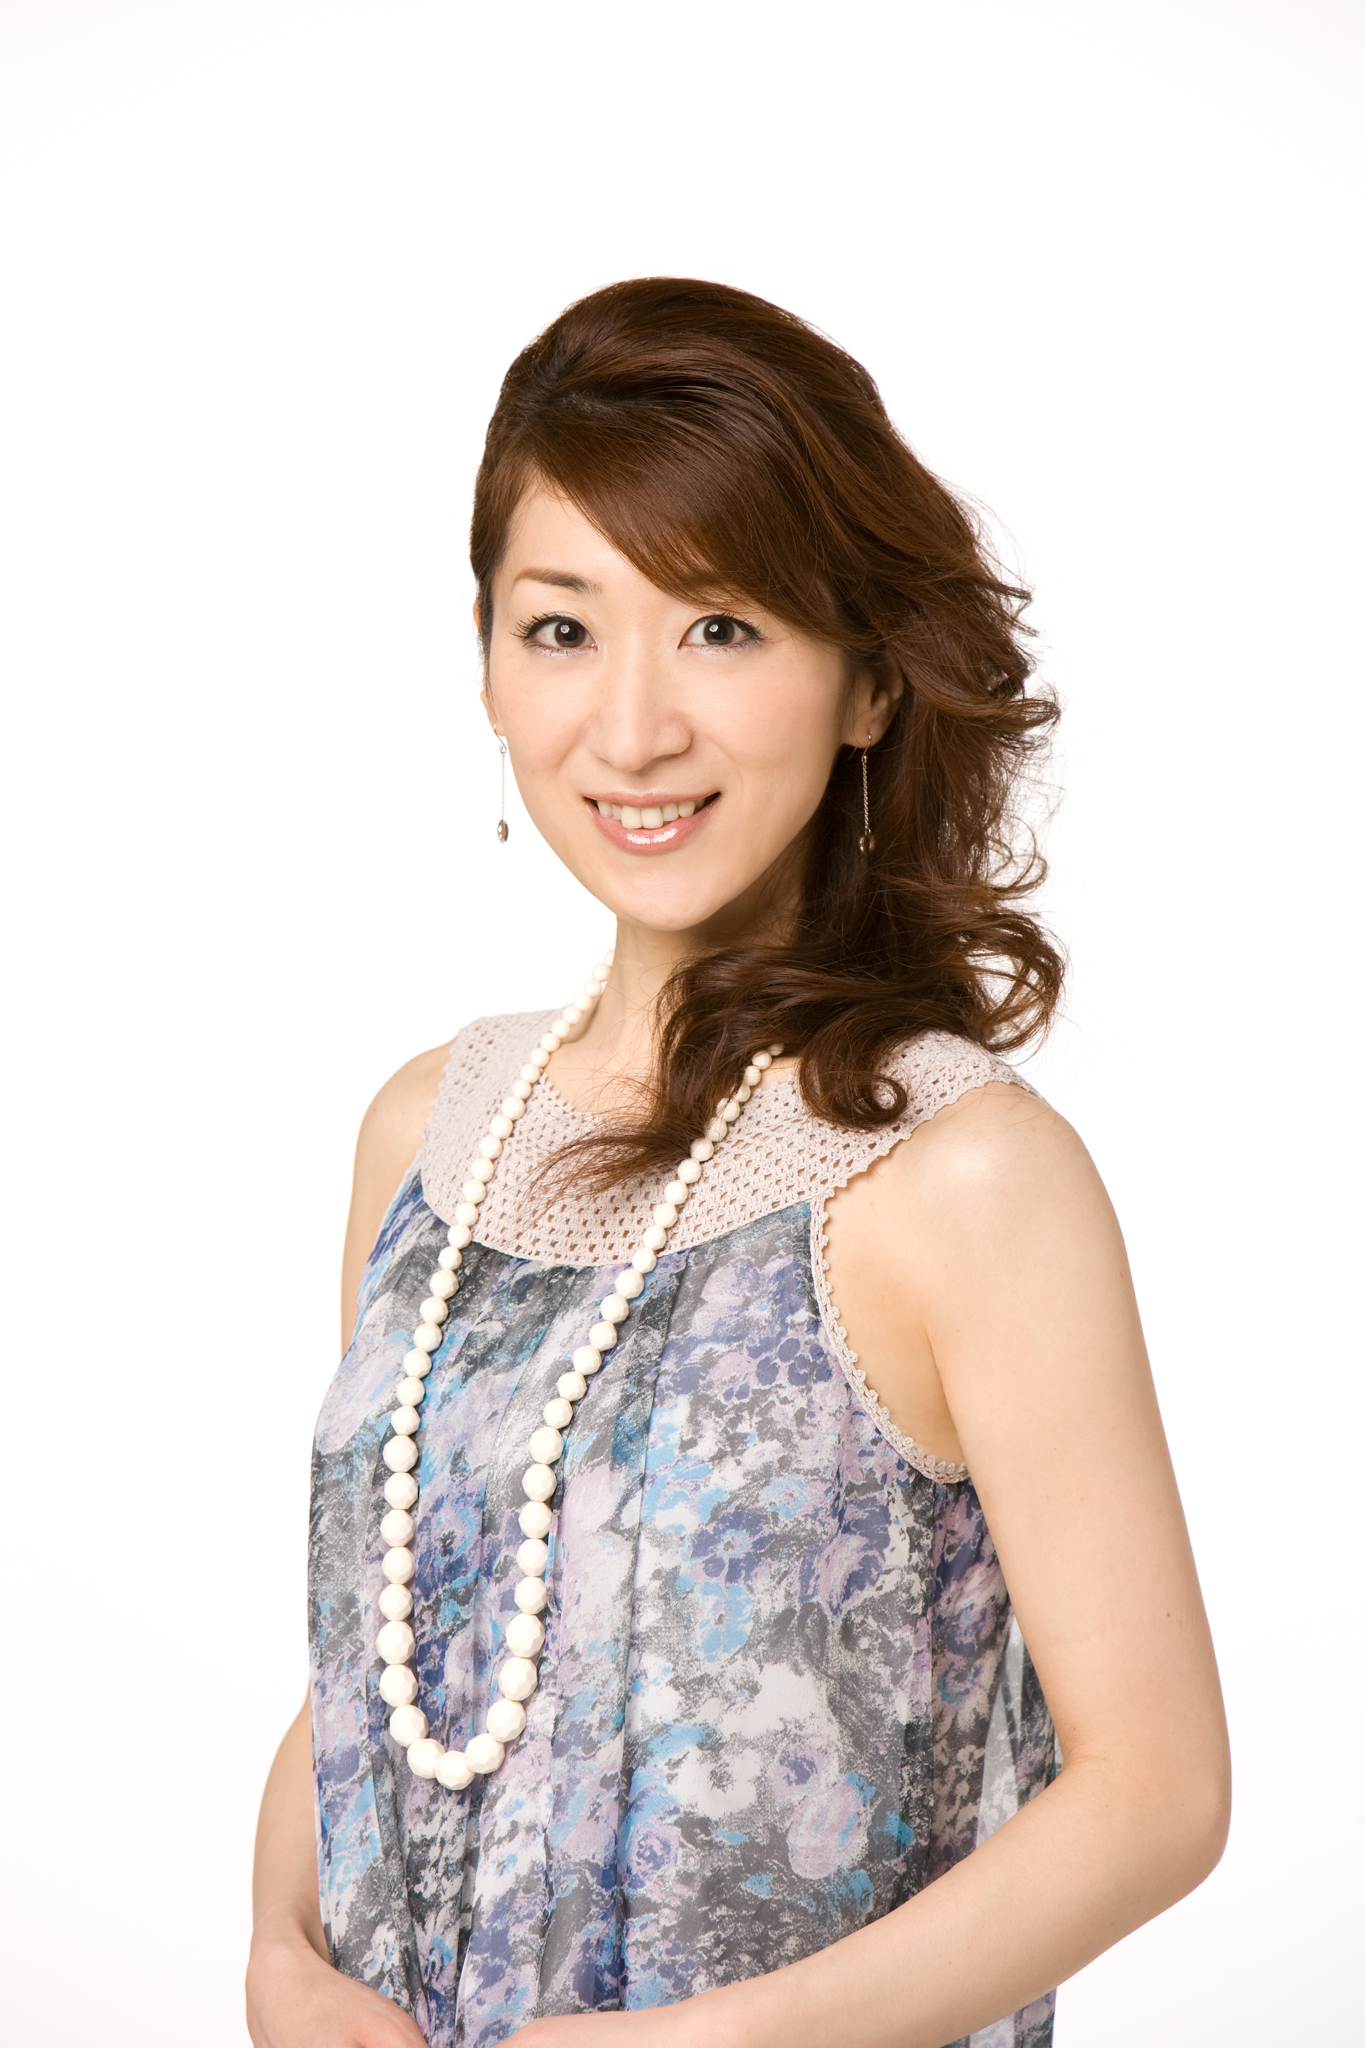 西尾夕紀/Yuki Nishio